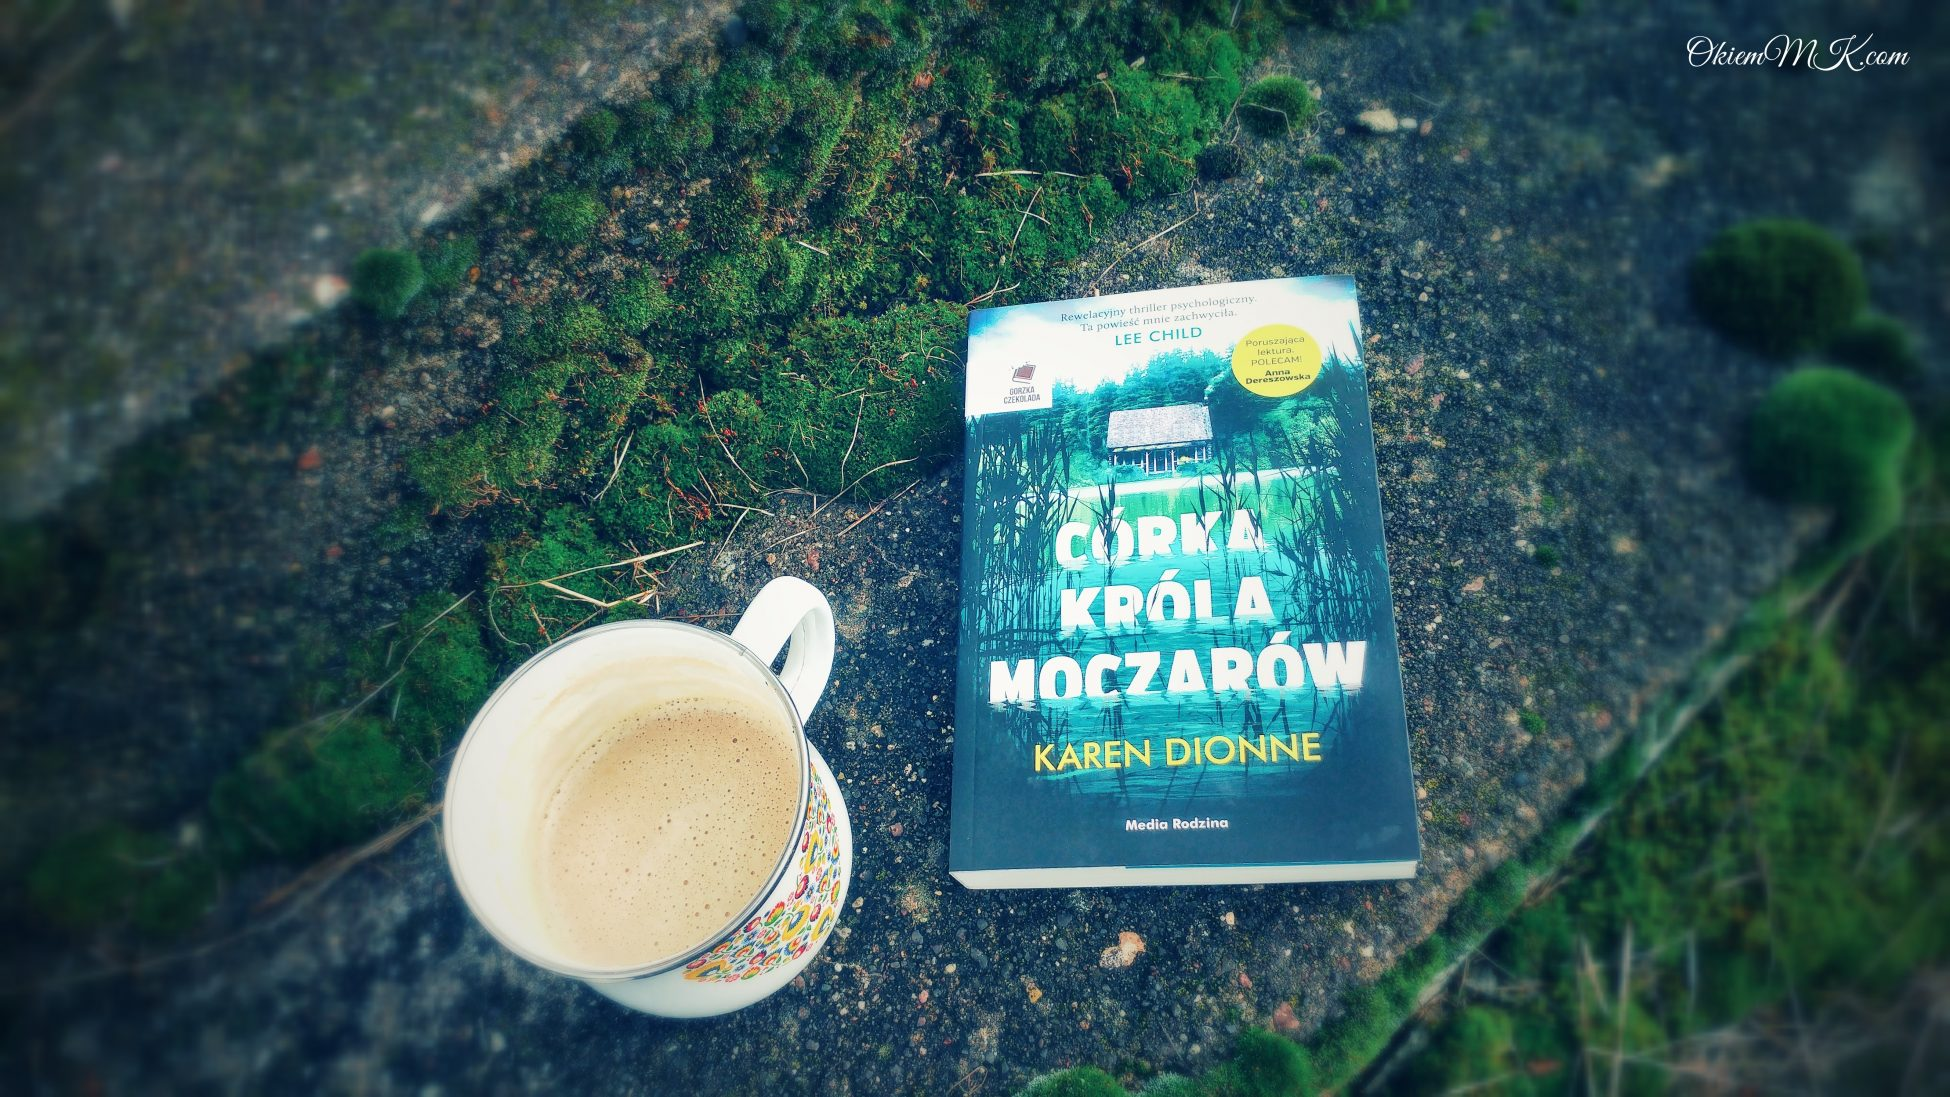 corka-krola-moczarow-karen-dionne